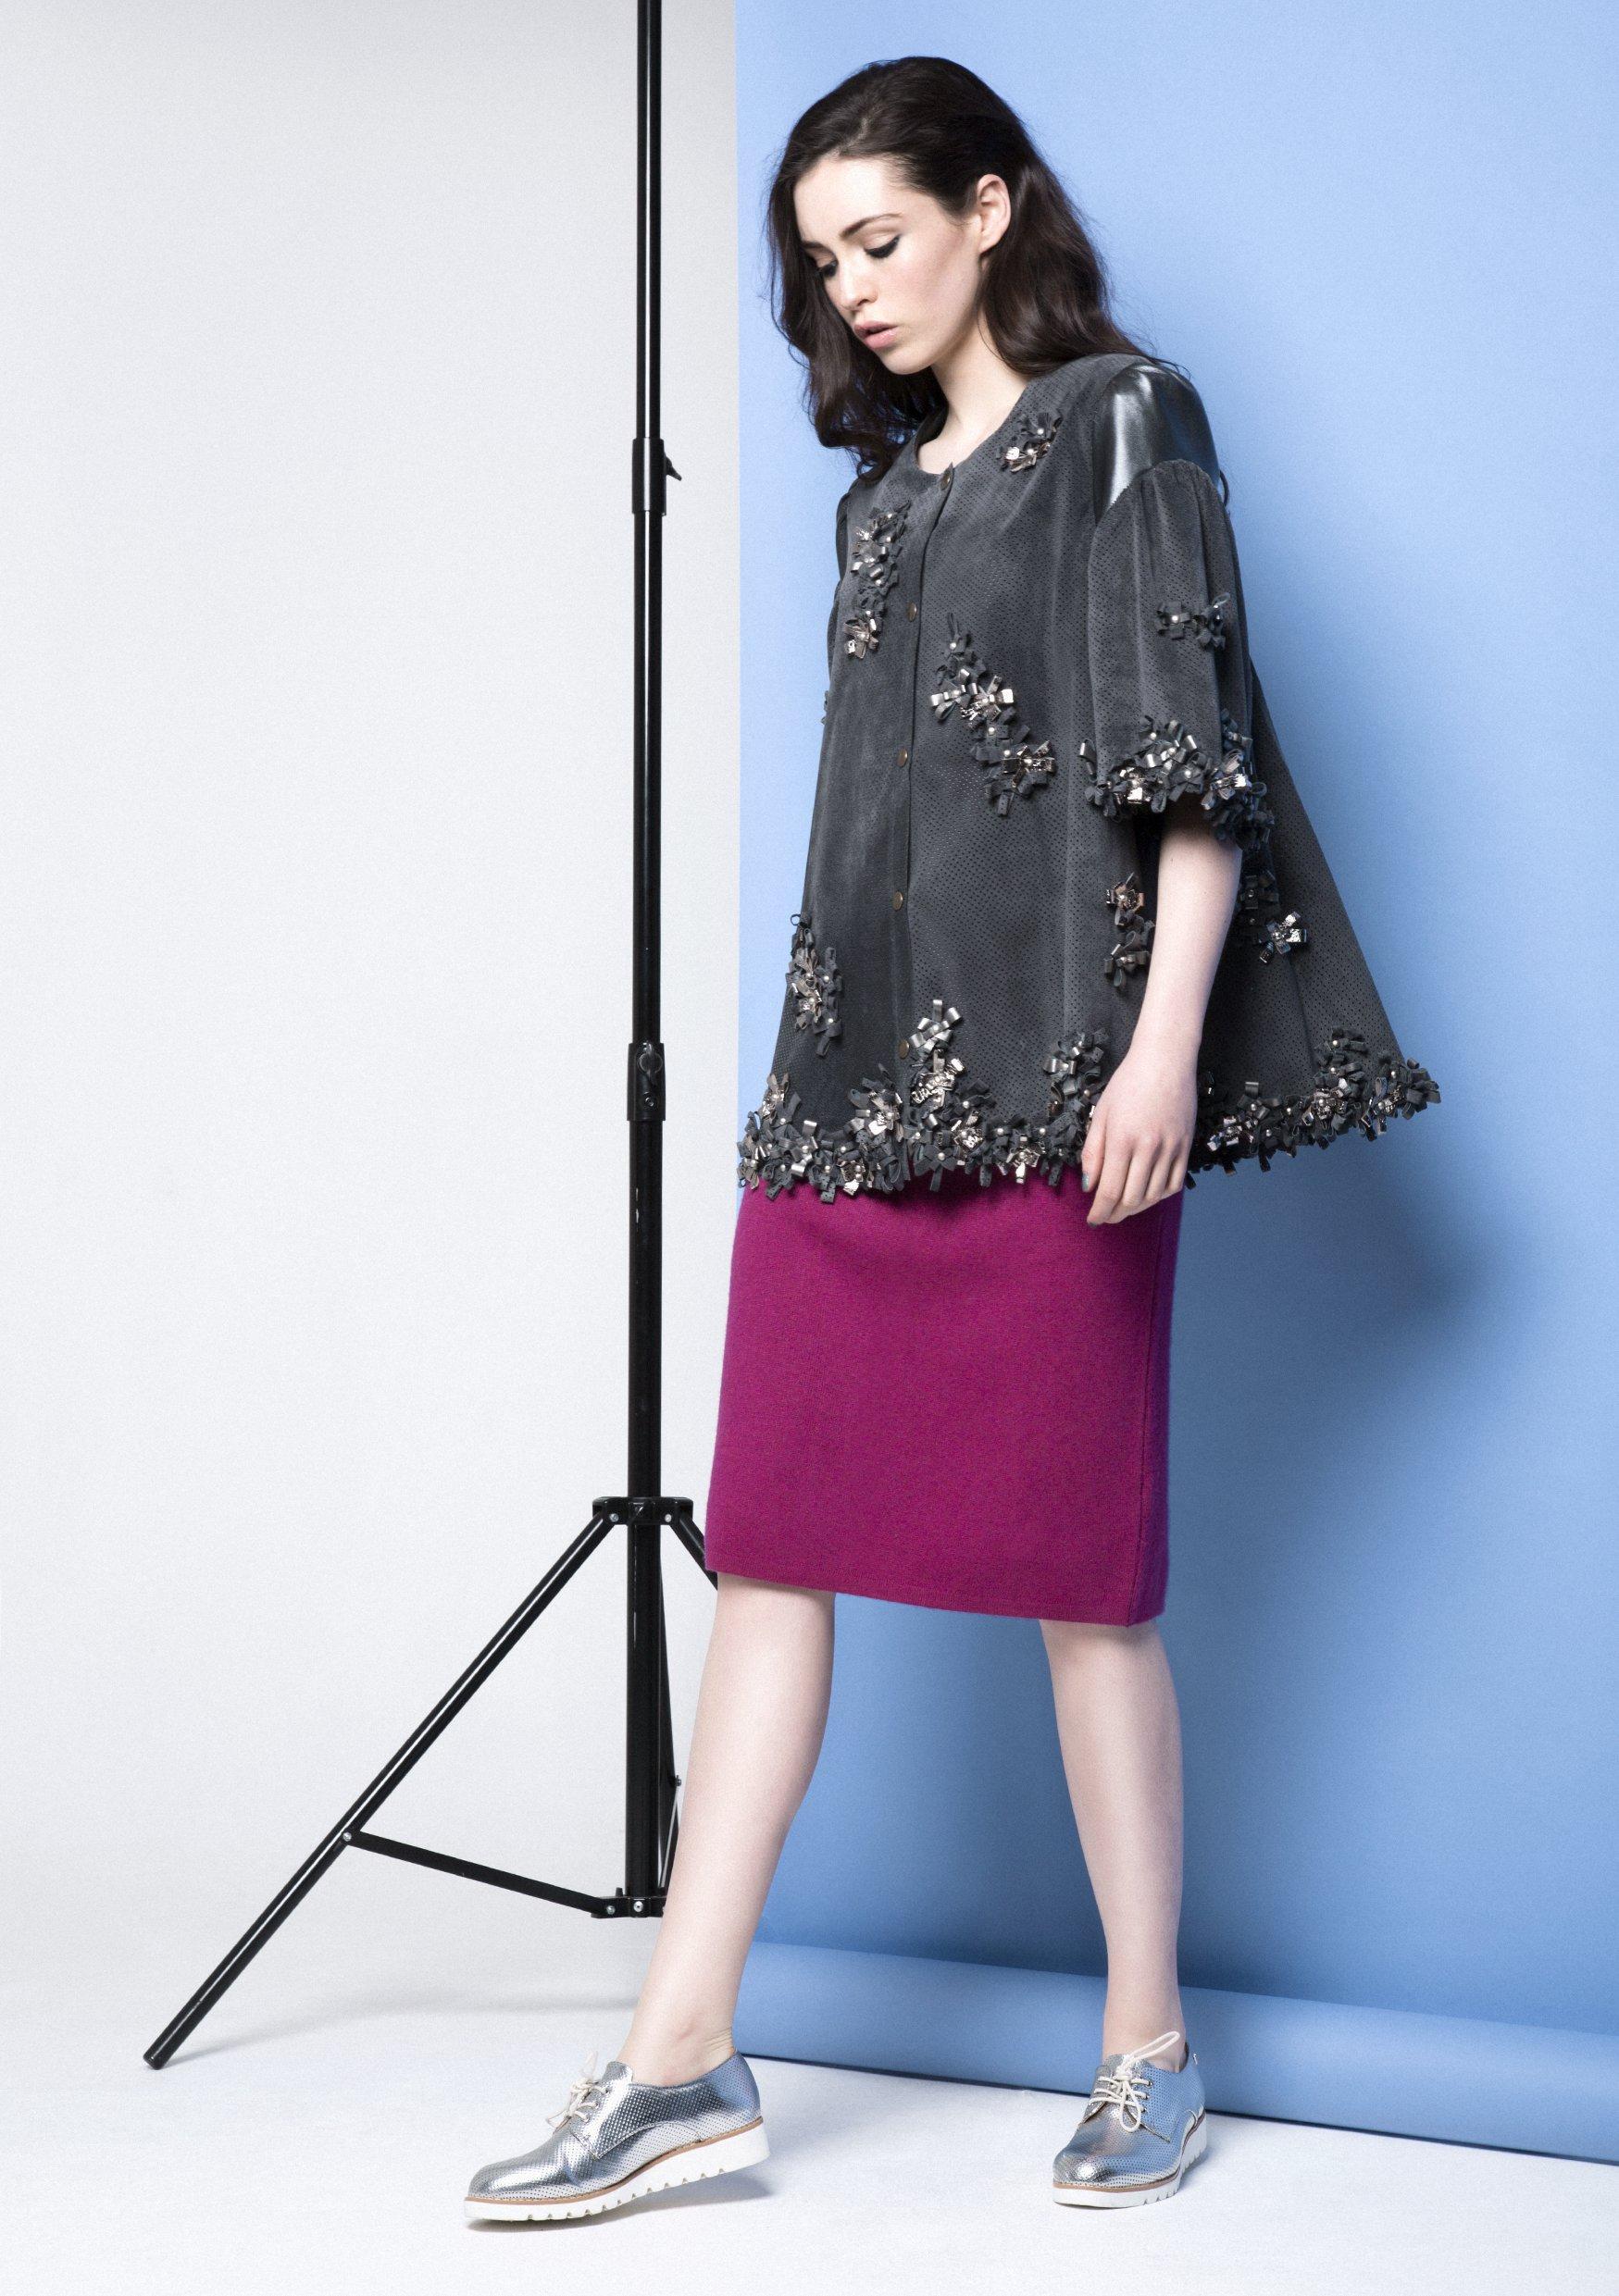 Manley AW15 Maya Bow Coat €594, Robin Skirt €175.jpg